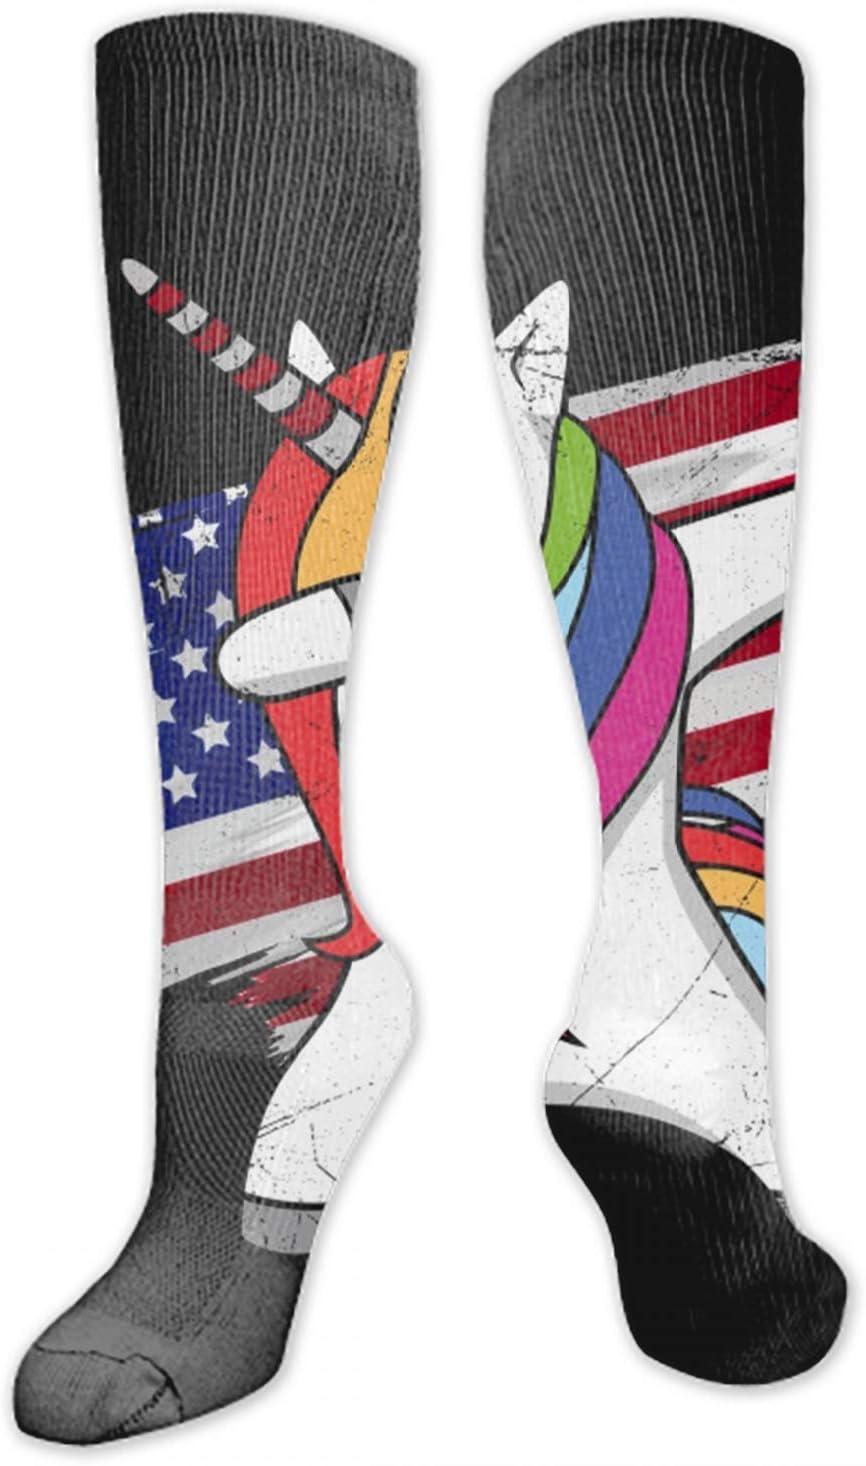 nadoab Women Socks American Flag Deer Knit Over Stockings Girls Tall Long Boot Leg Warmers